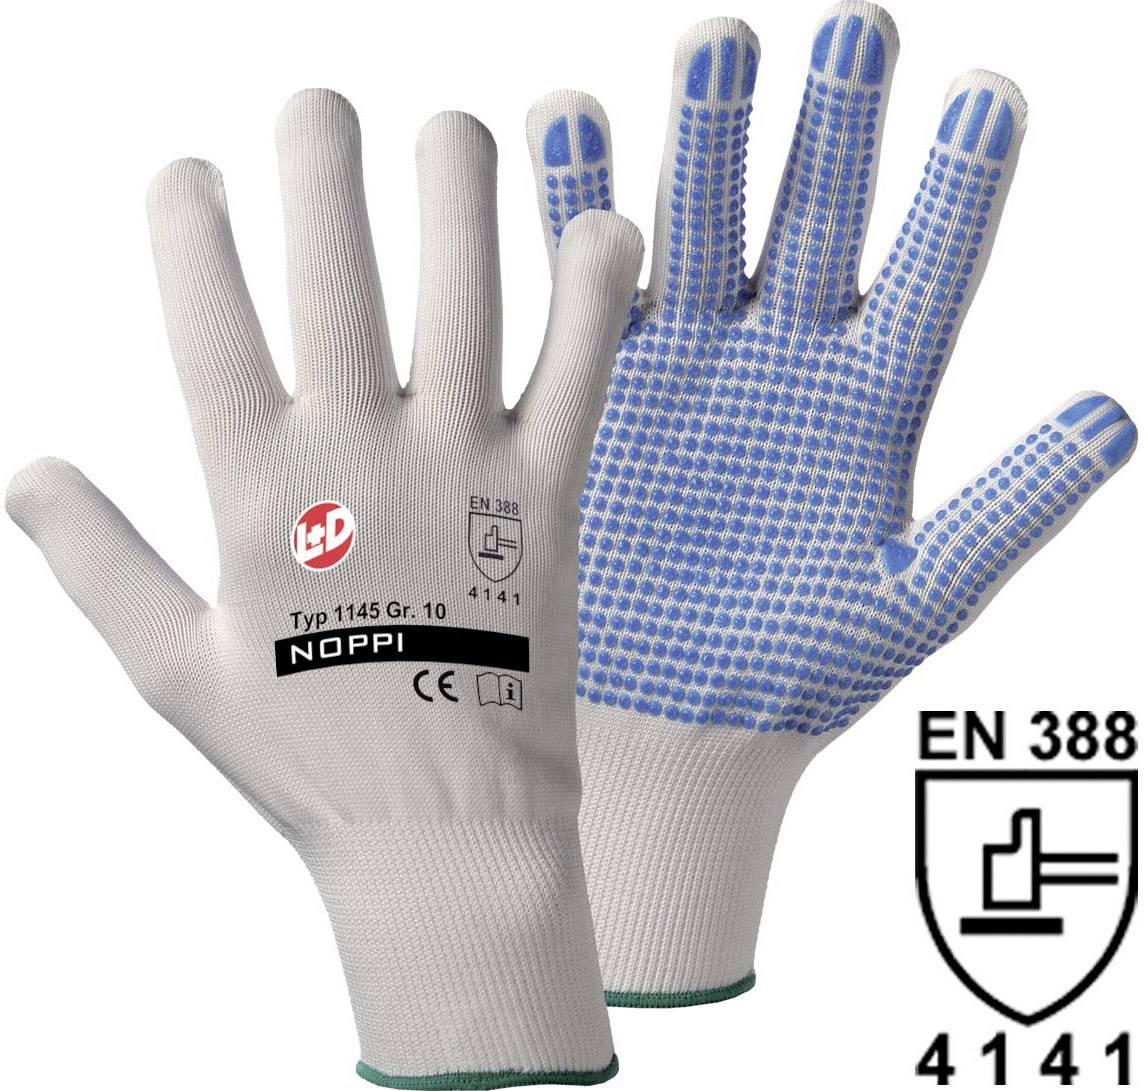 Pracovné rukavice L+D NOPPI 1145, velikost rukavic: 10, XL